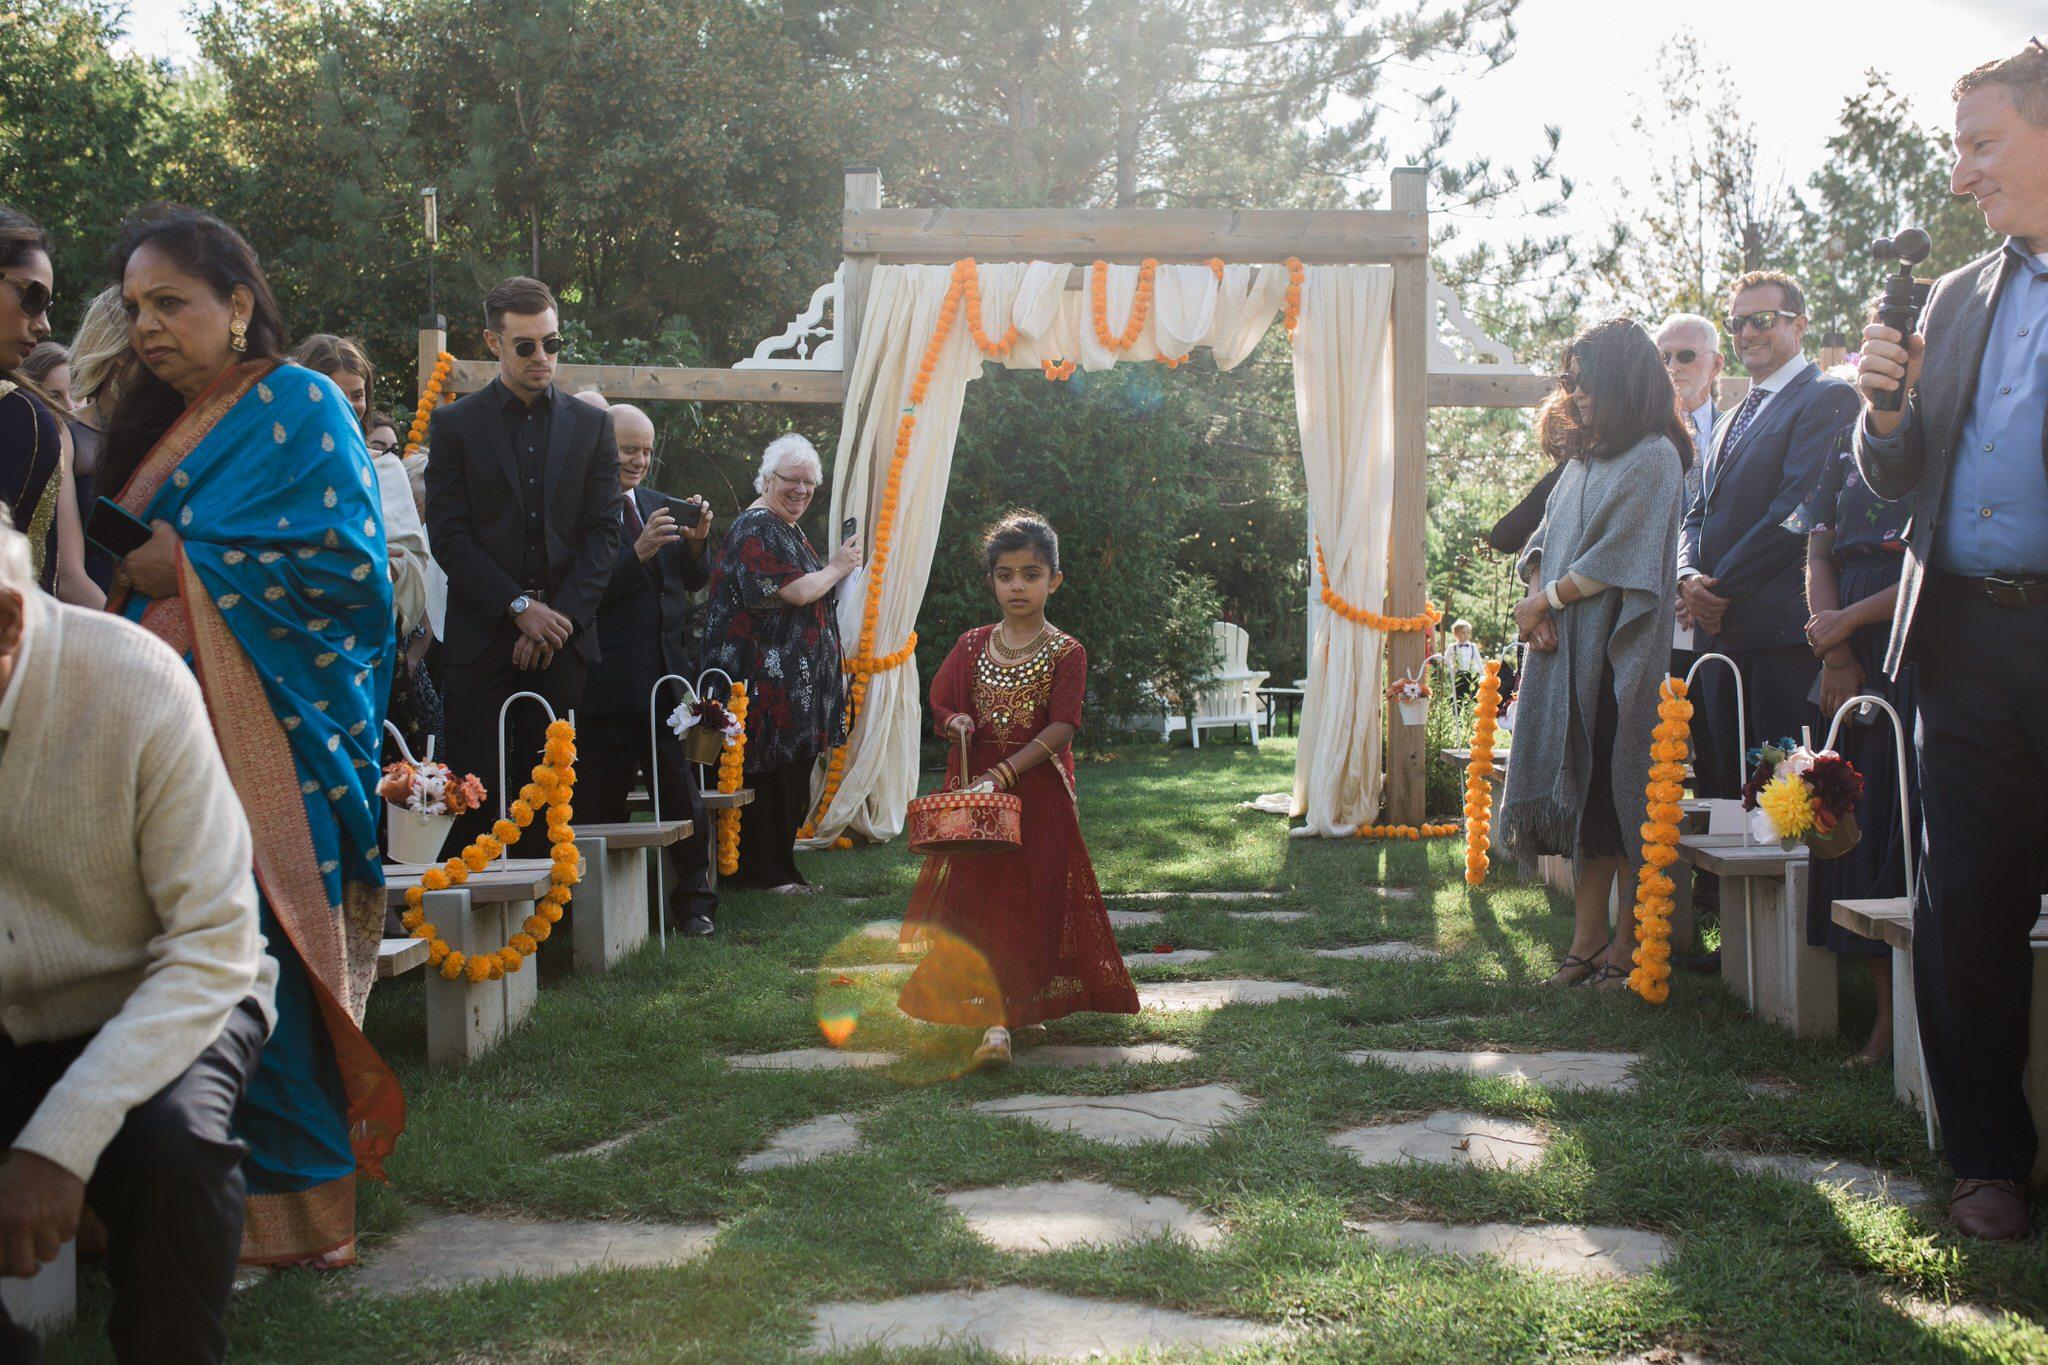 Northview Gardens Wedding - flower girl